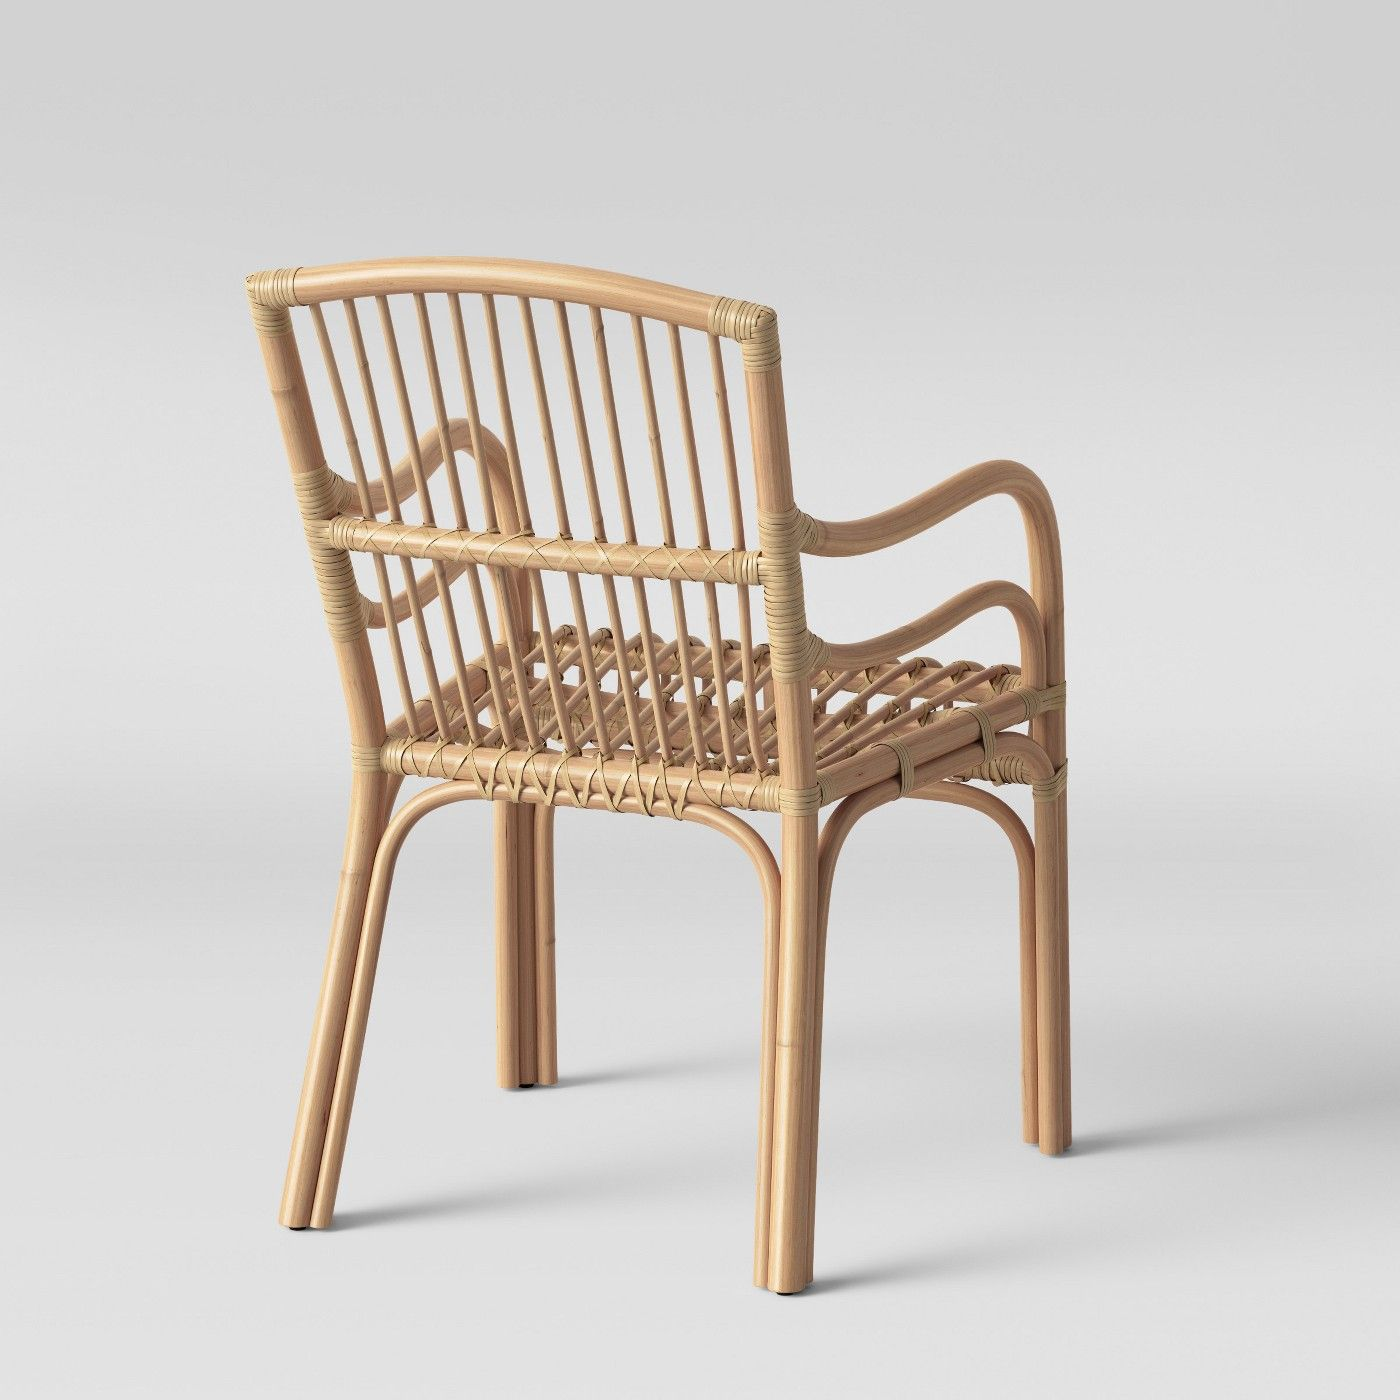 Bella rattan arm chair opalhouse image 4 of 4 chair